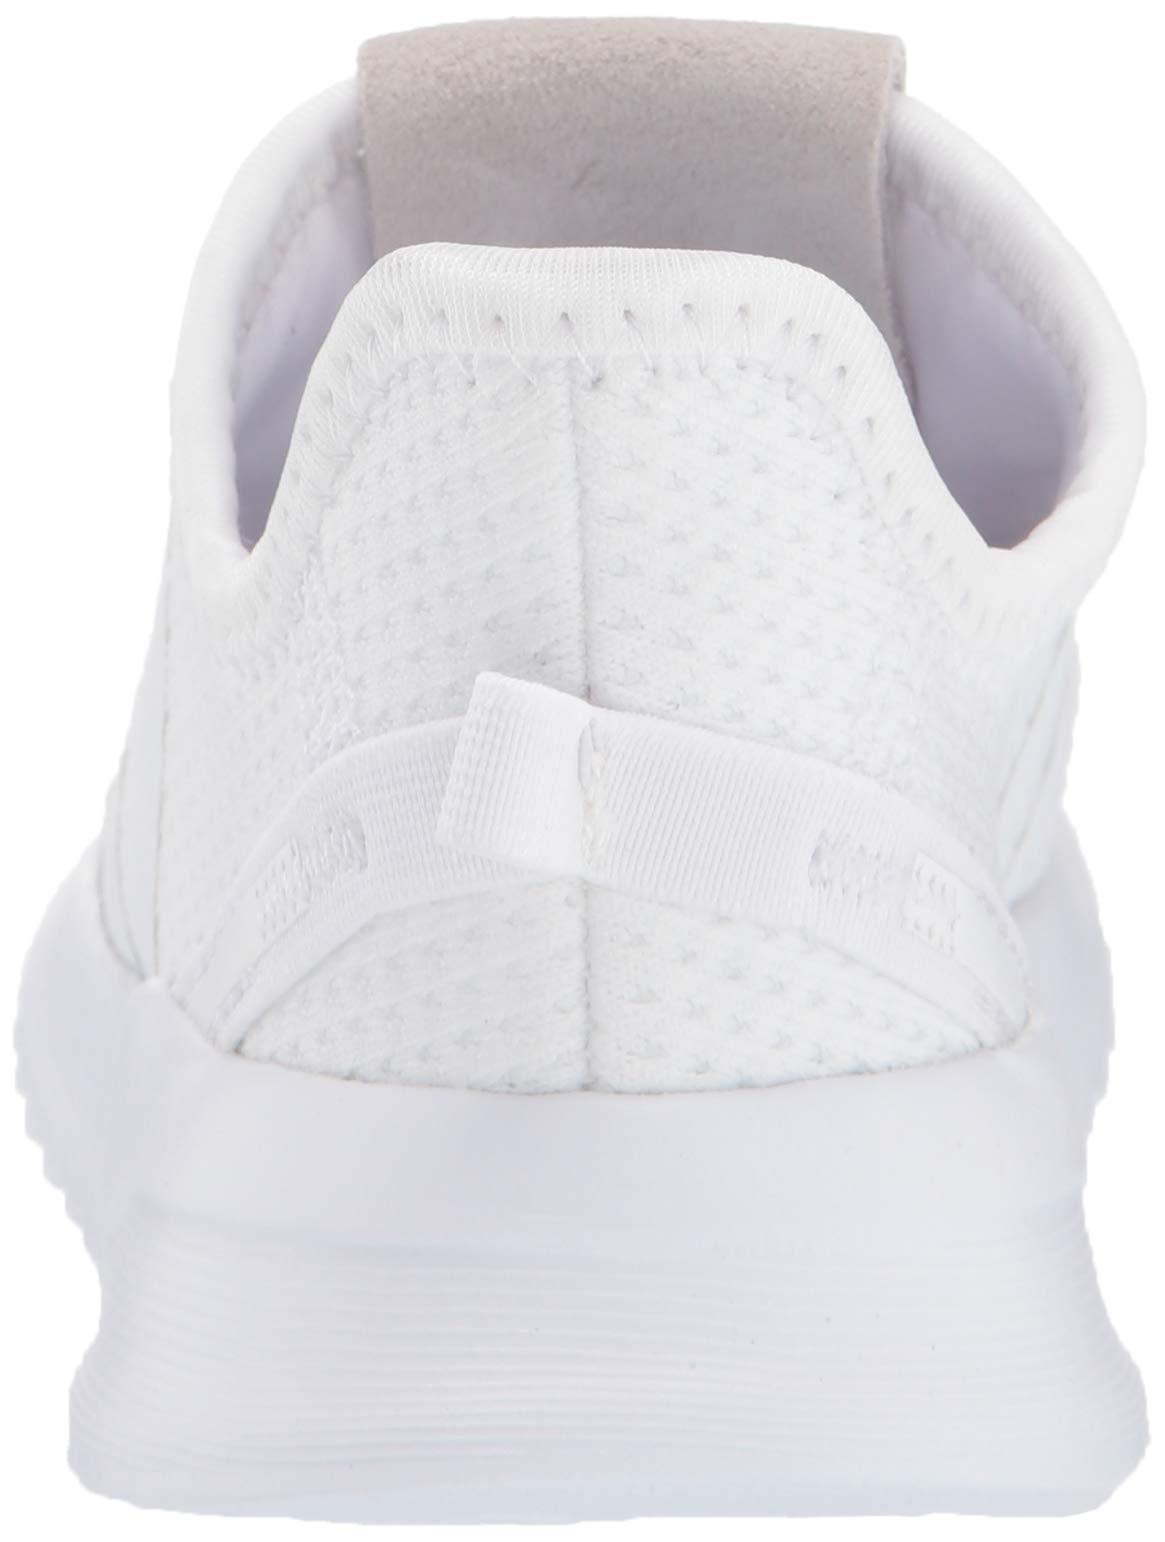 adidas Originals Baby U_Path Running Shoe White, 5.5K M US Toddler by adidas Originals (Image #2)